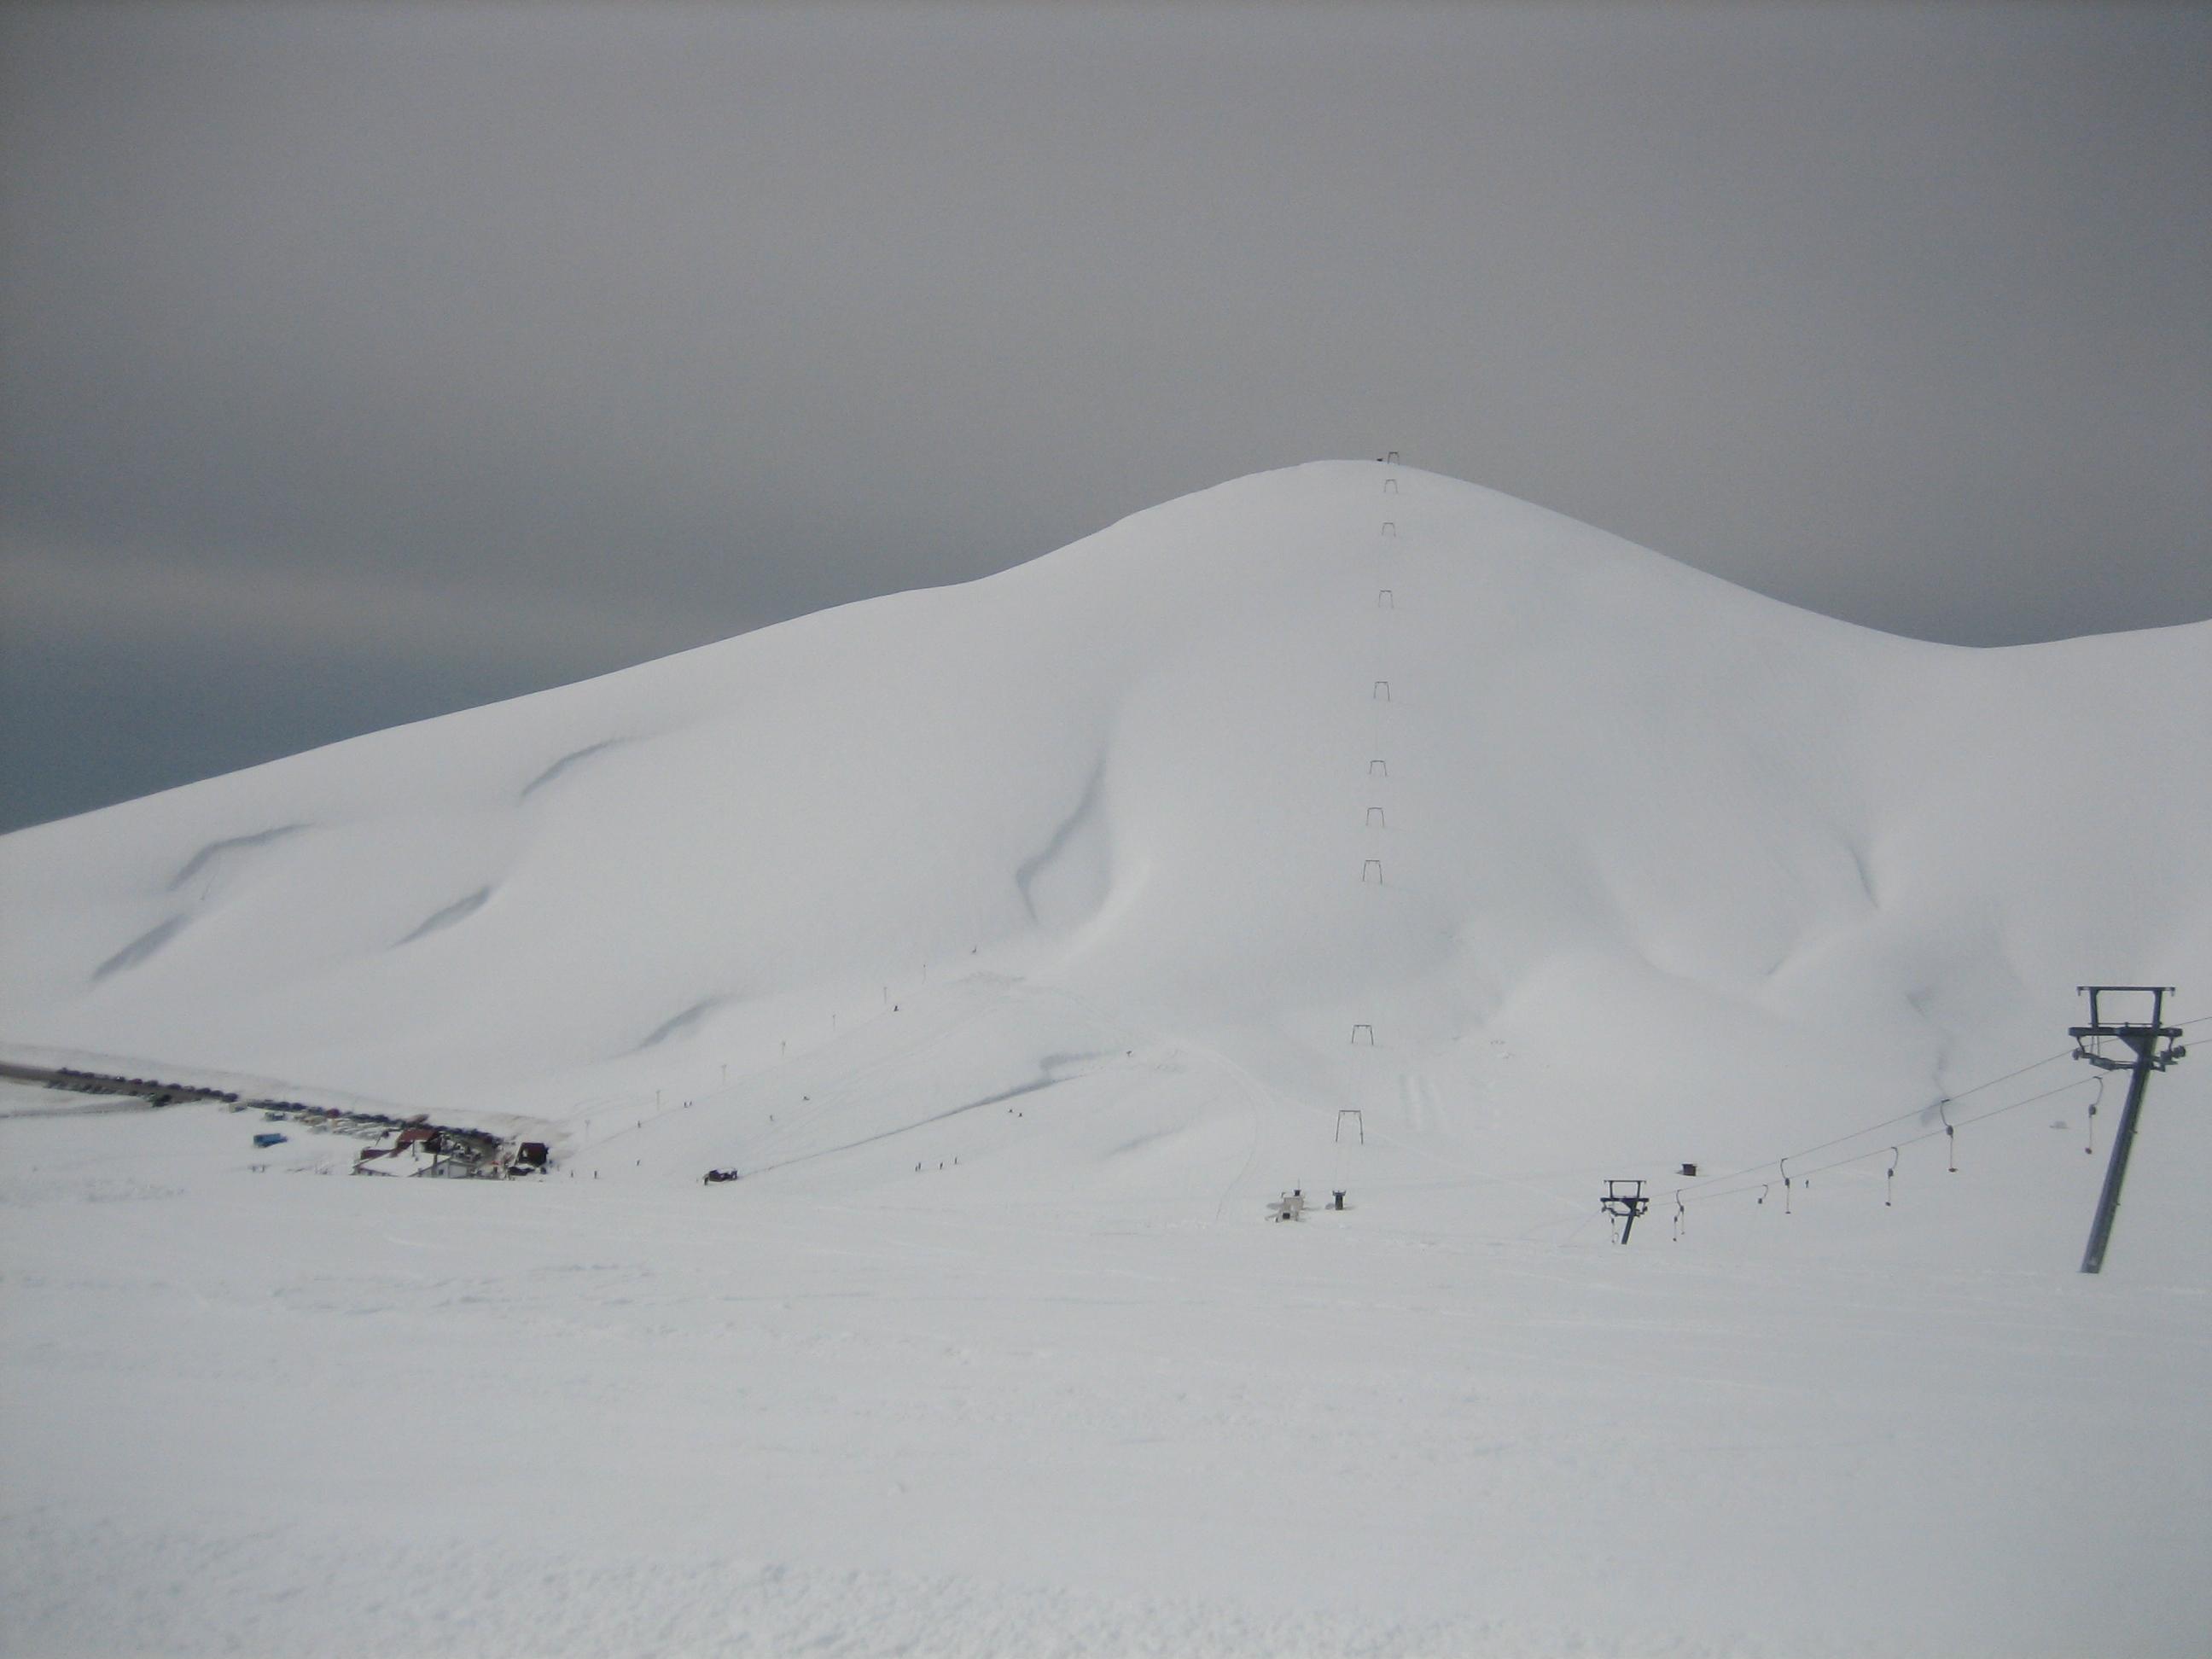 papous 2/3/2013, Falakro Ski Resort